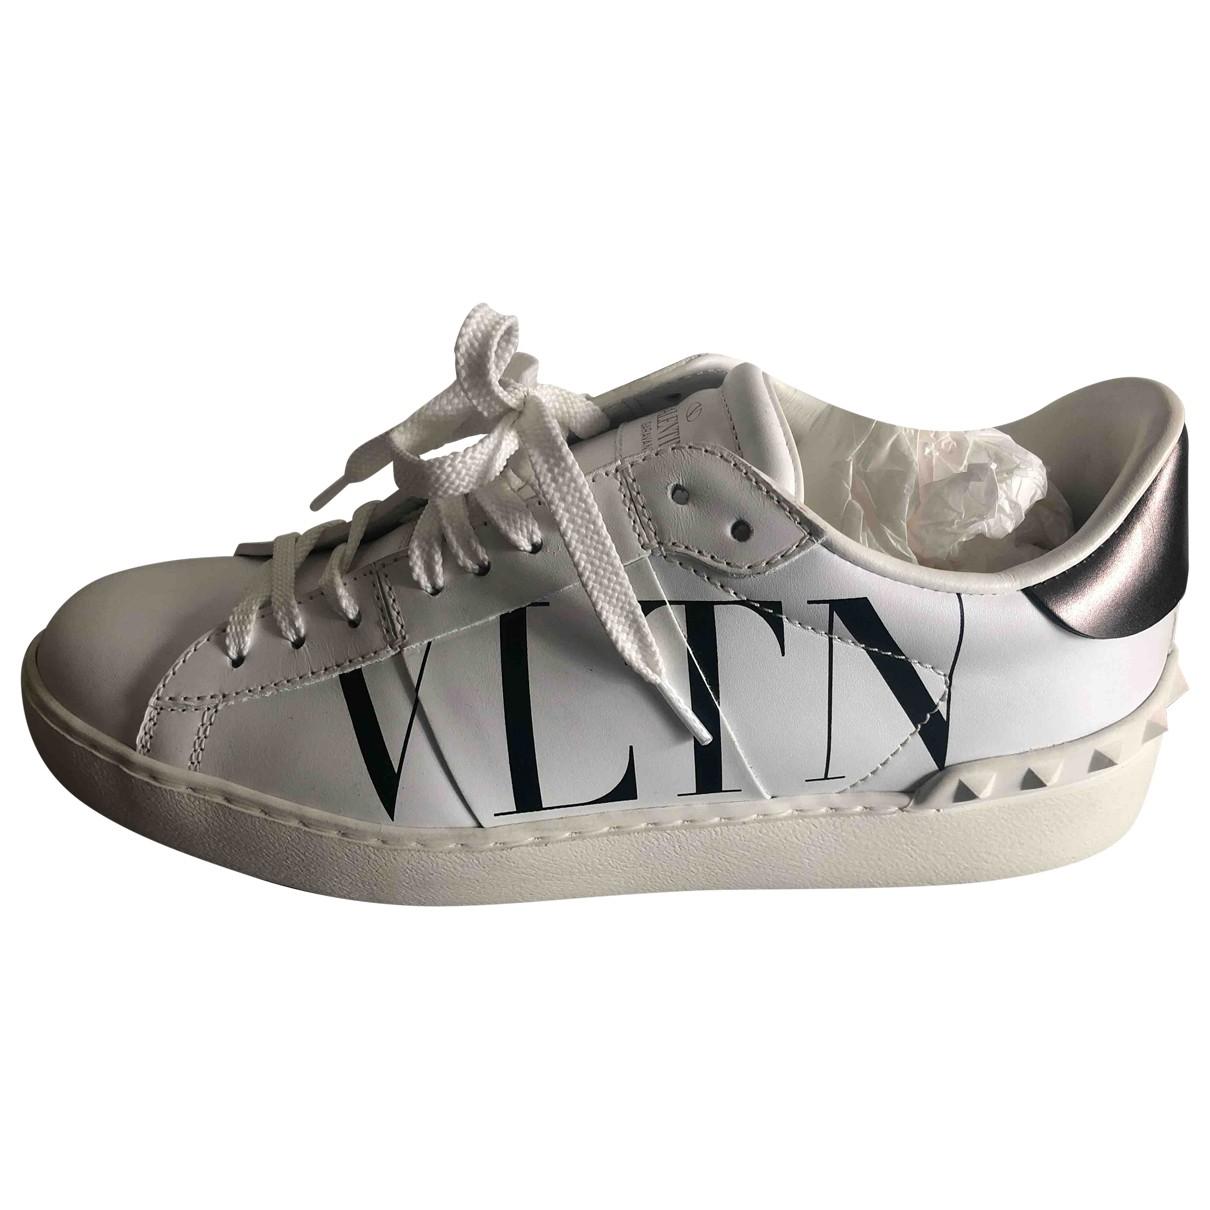 Valentino Garavani Rockstud White Leather Trainers for Women 5 UK